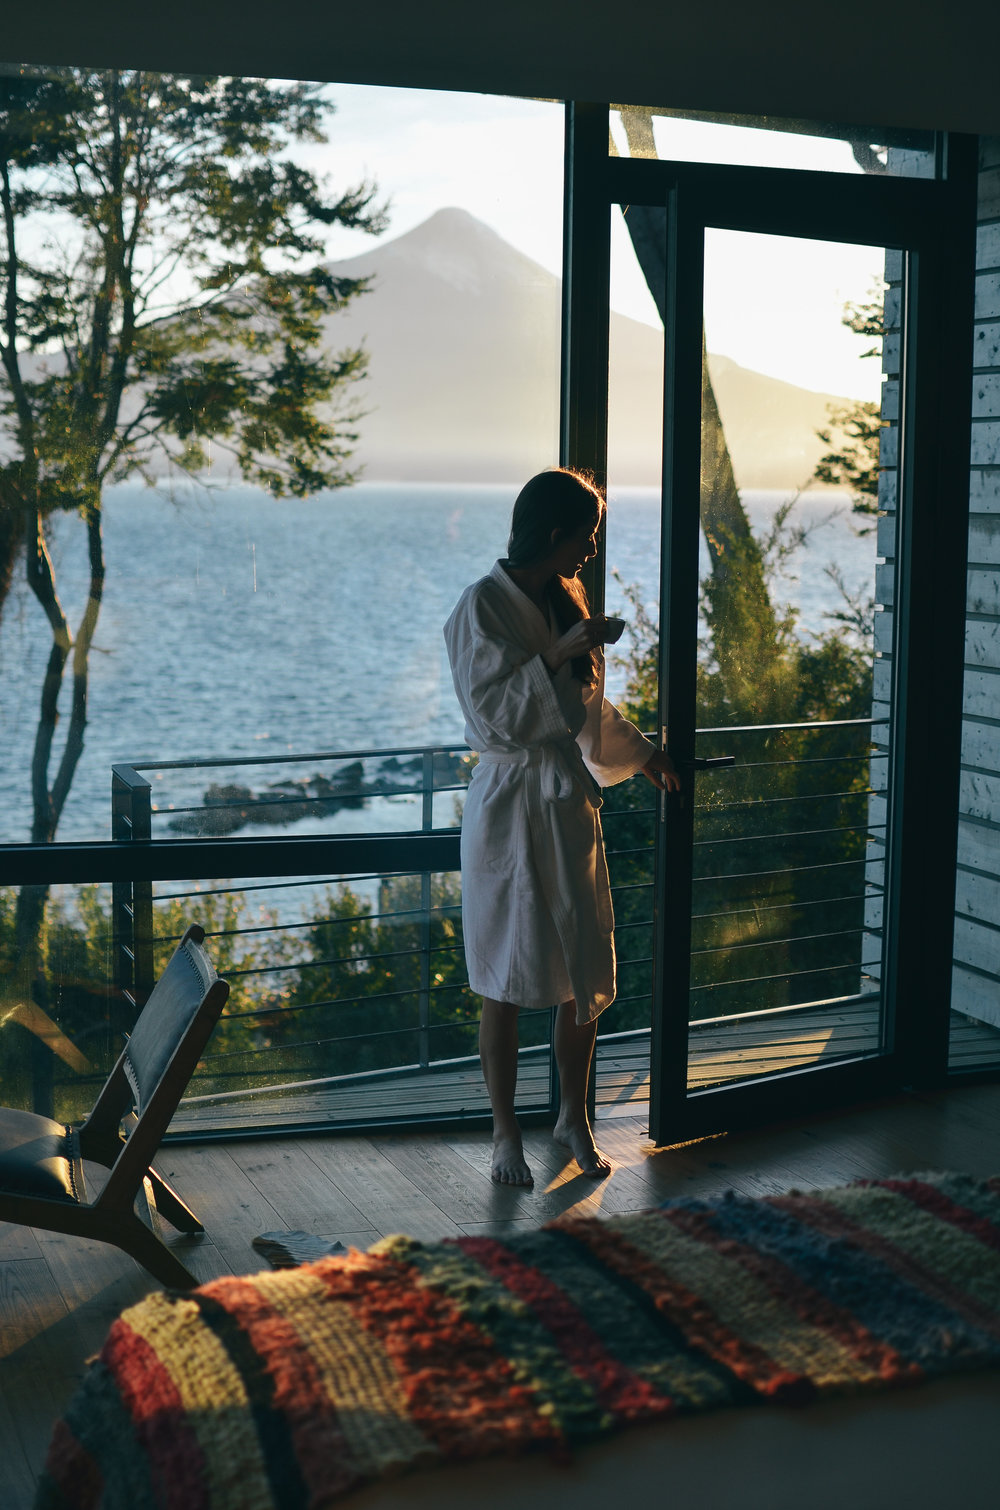 chile+awa+hotel+travel+guide+life+on+pine_DSC_1503.jpg